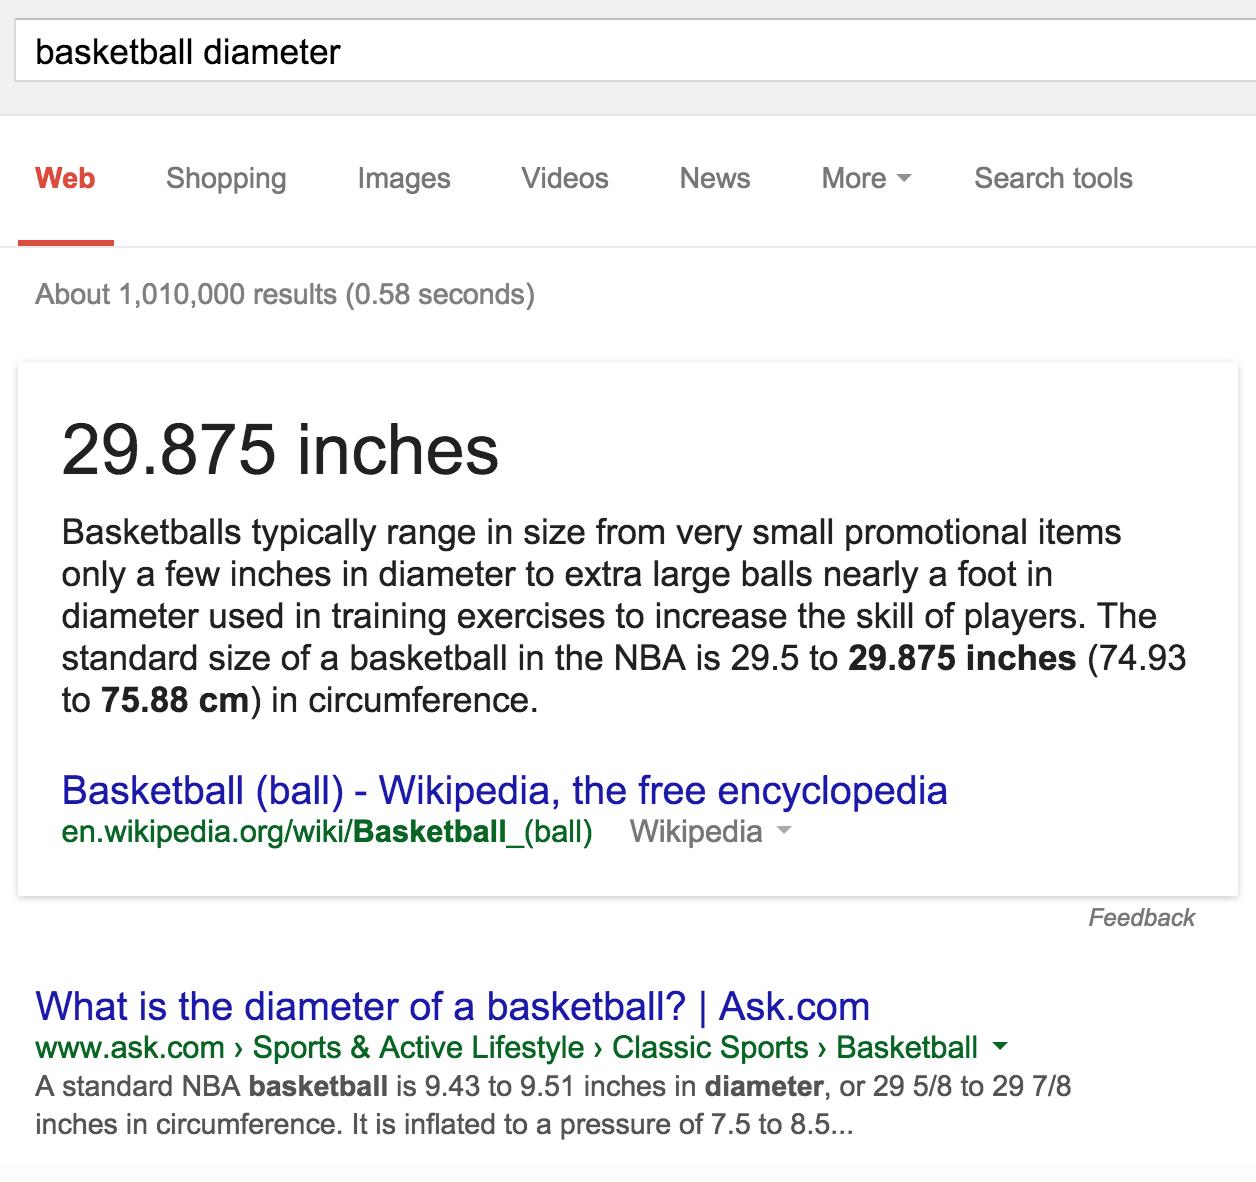 basketball diameter